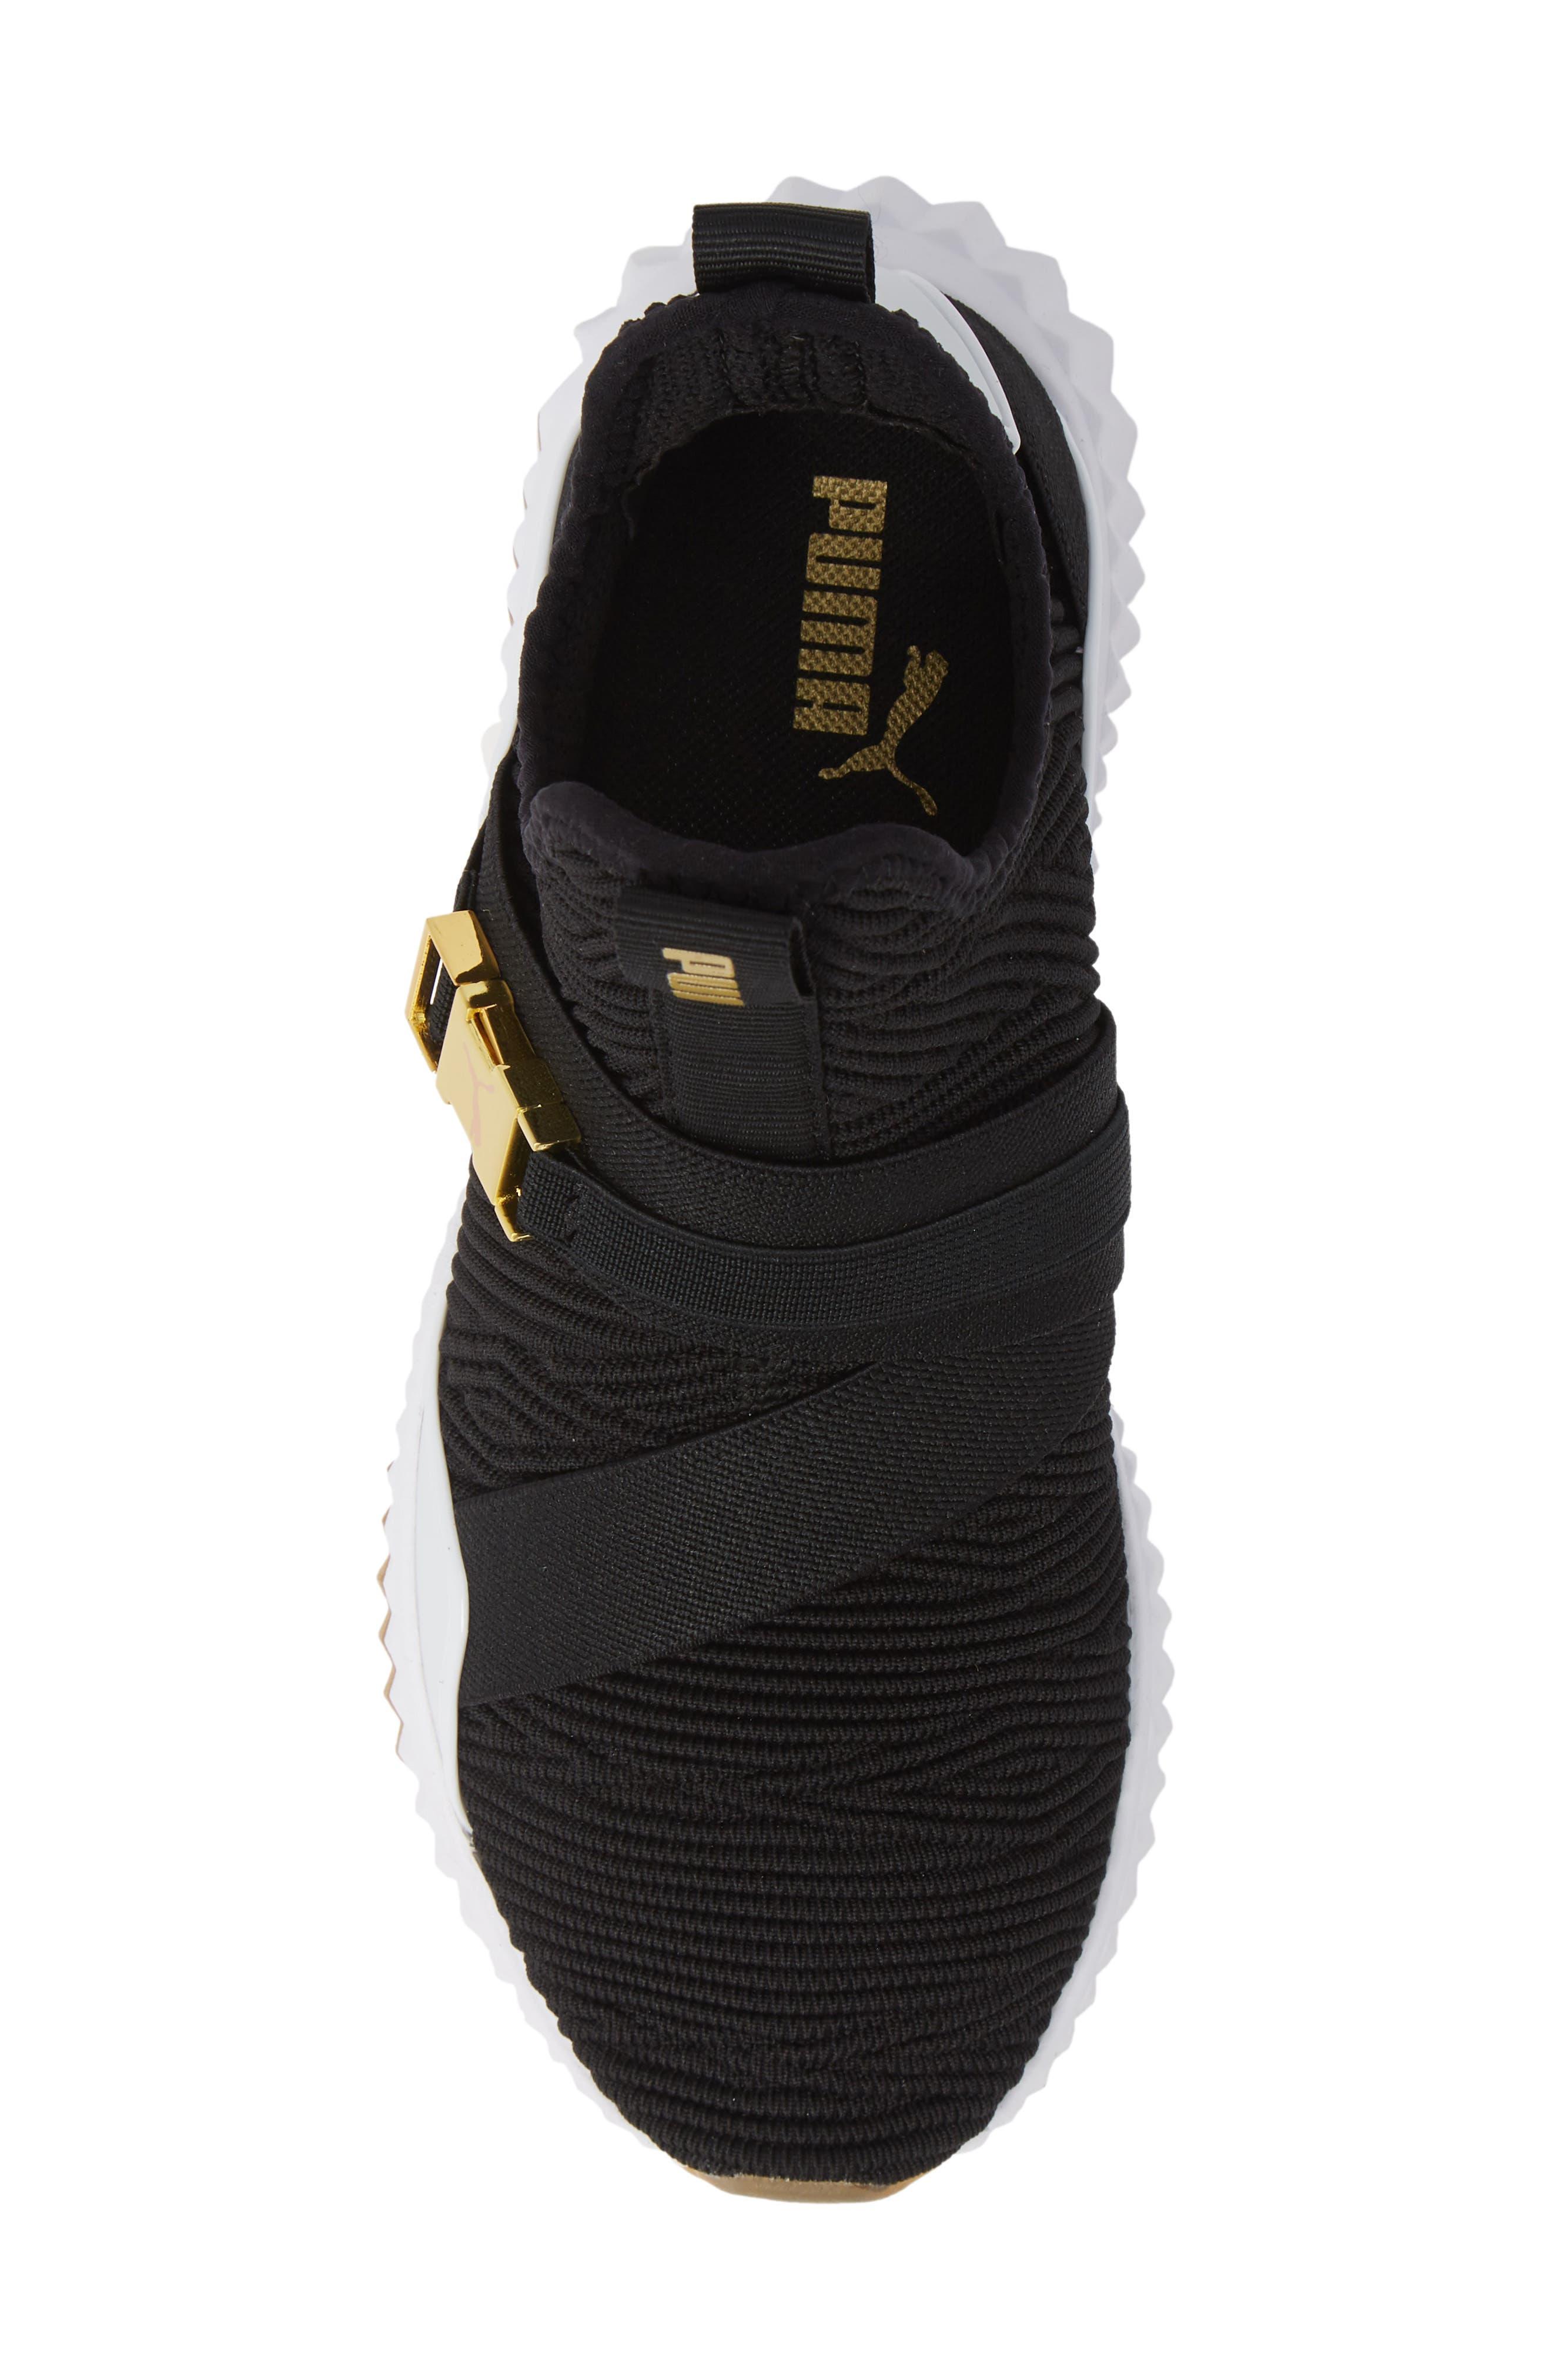 PUMA, Defy Mid Varsity Sneaker, Alternate thumbnail 5, color, BLACK/ METALLIC GOLD